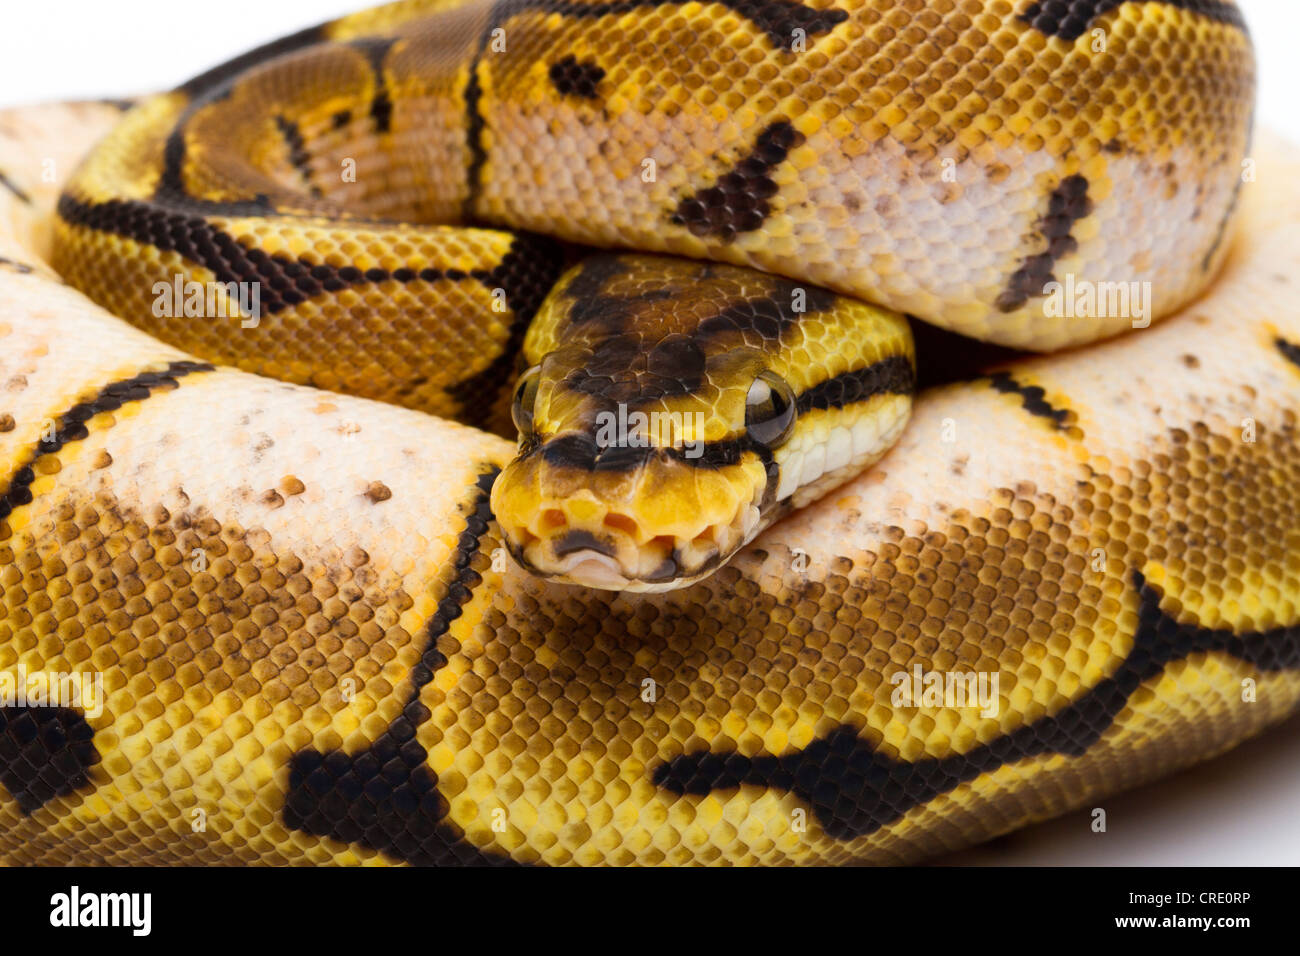 Snake Breeding Stock Photos & Snake Breeding Stock Images - Alamy